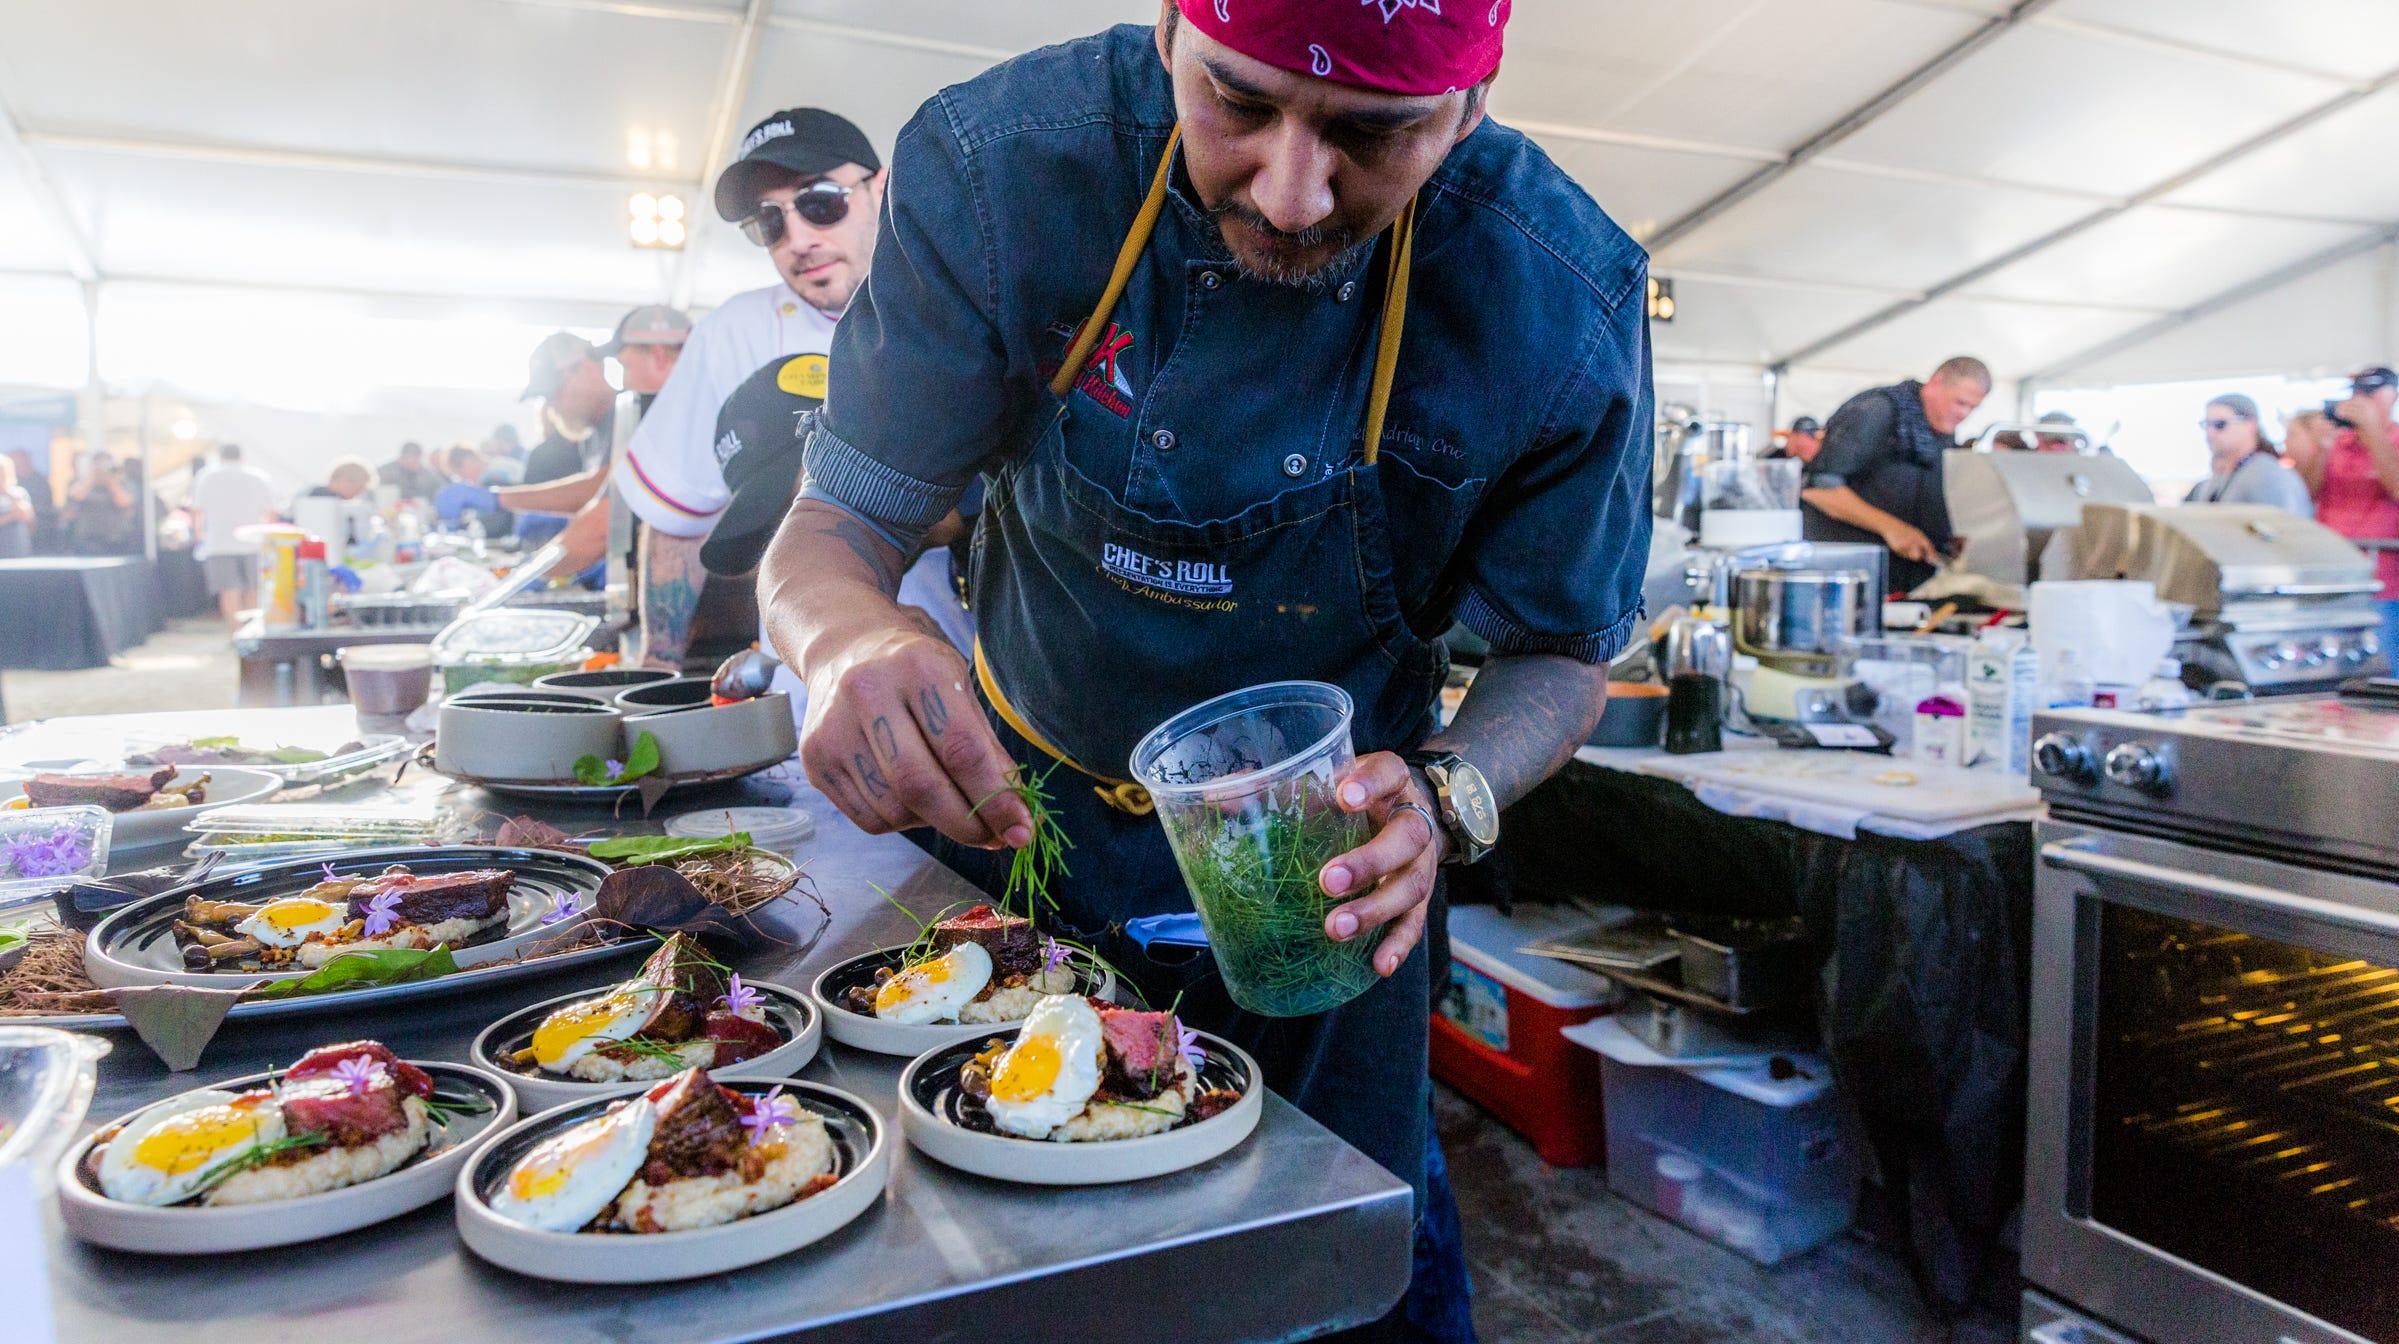 A competitor puts finishing garnish on his presentation dish at the 2017 World Food Championships.